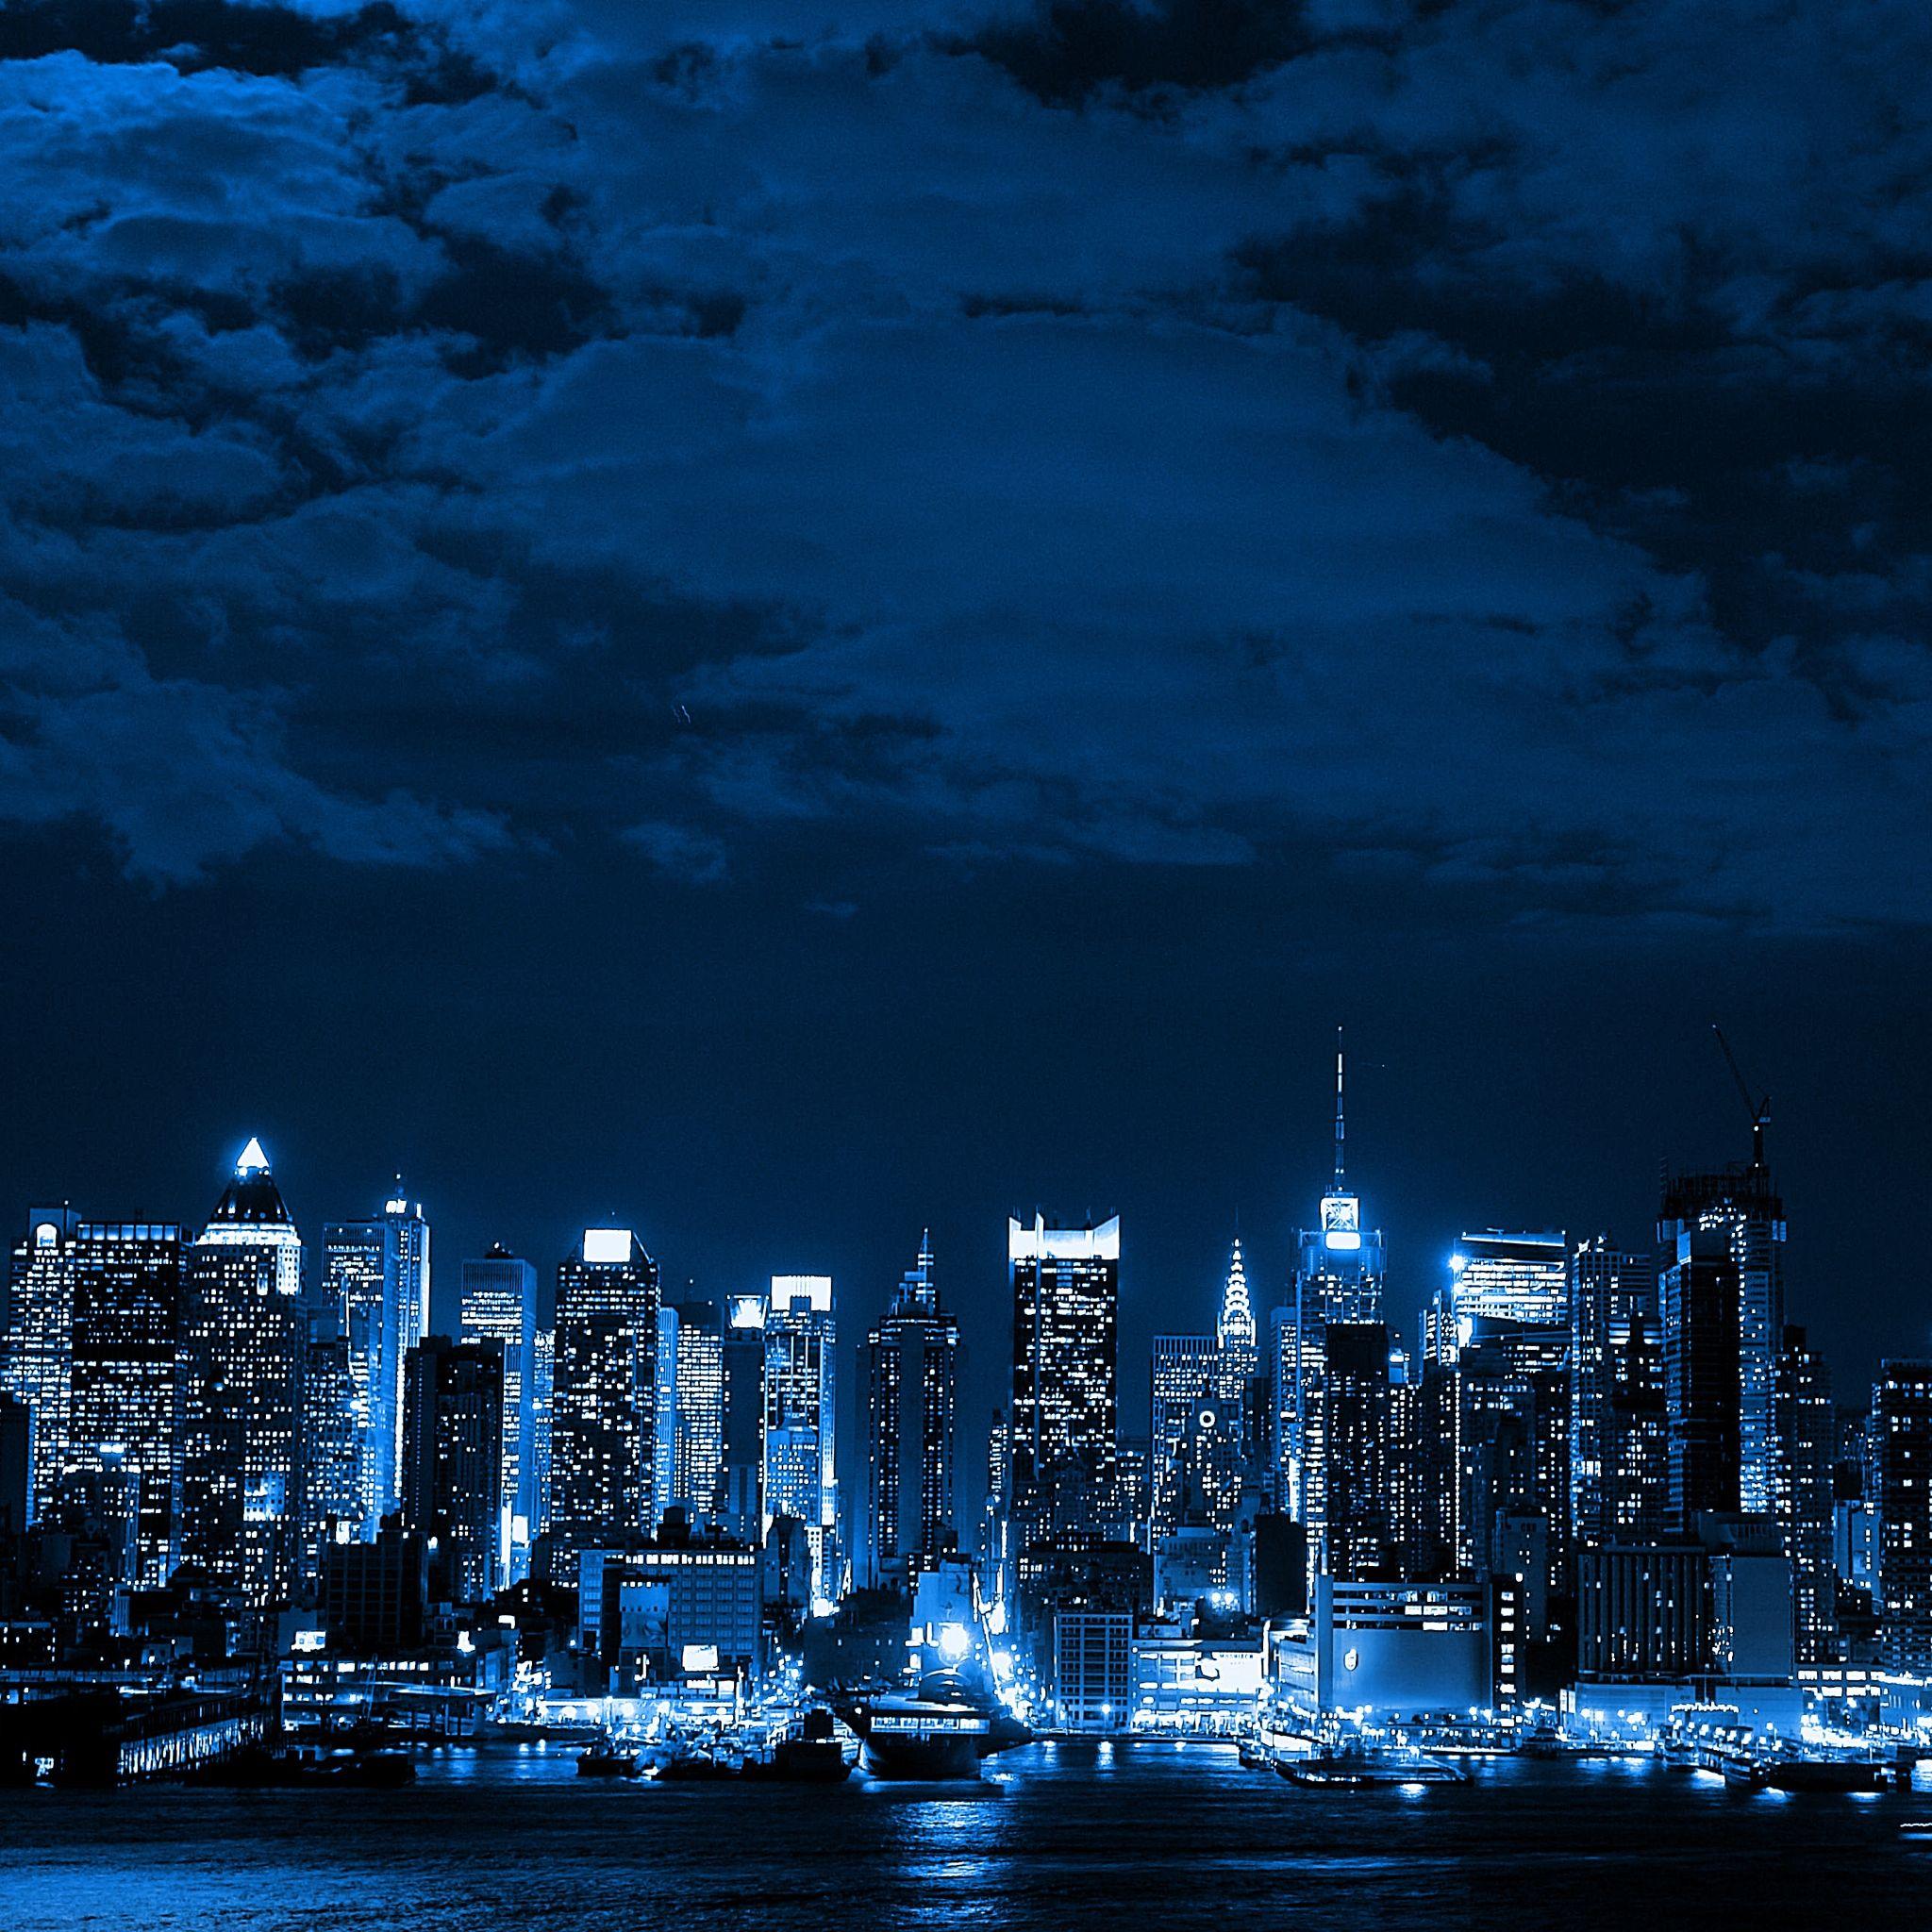 Blue And Black City Cityscape Wallpaper City Wallpaper Skyline